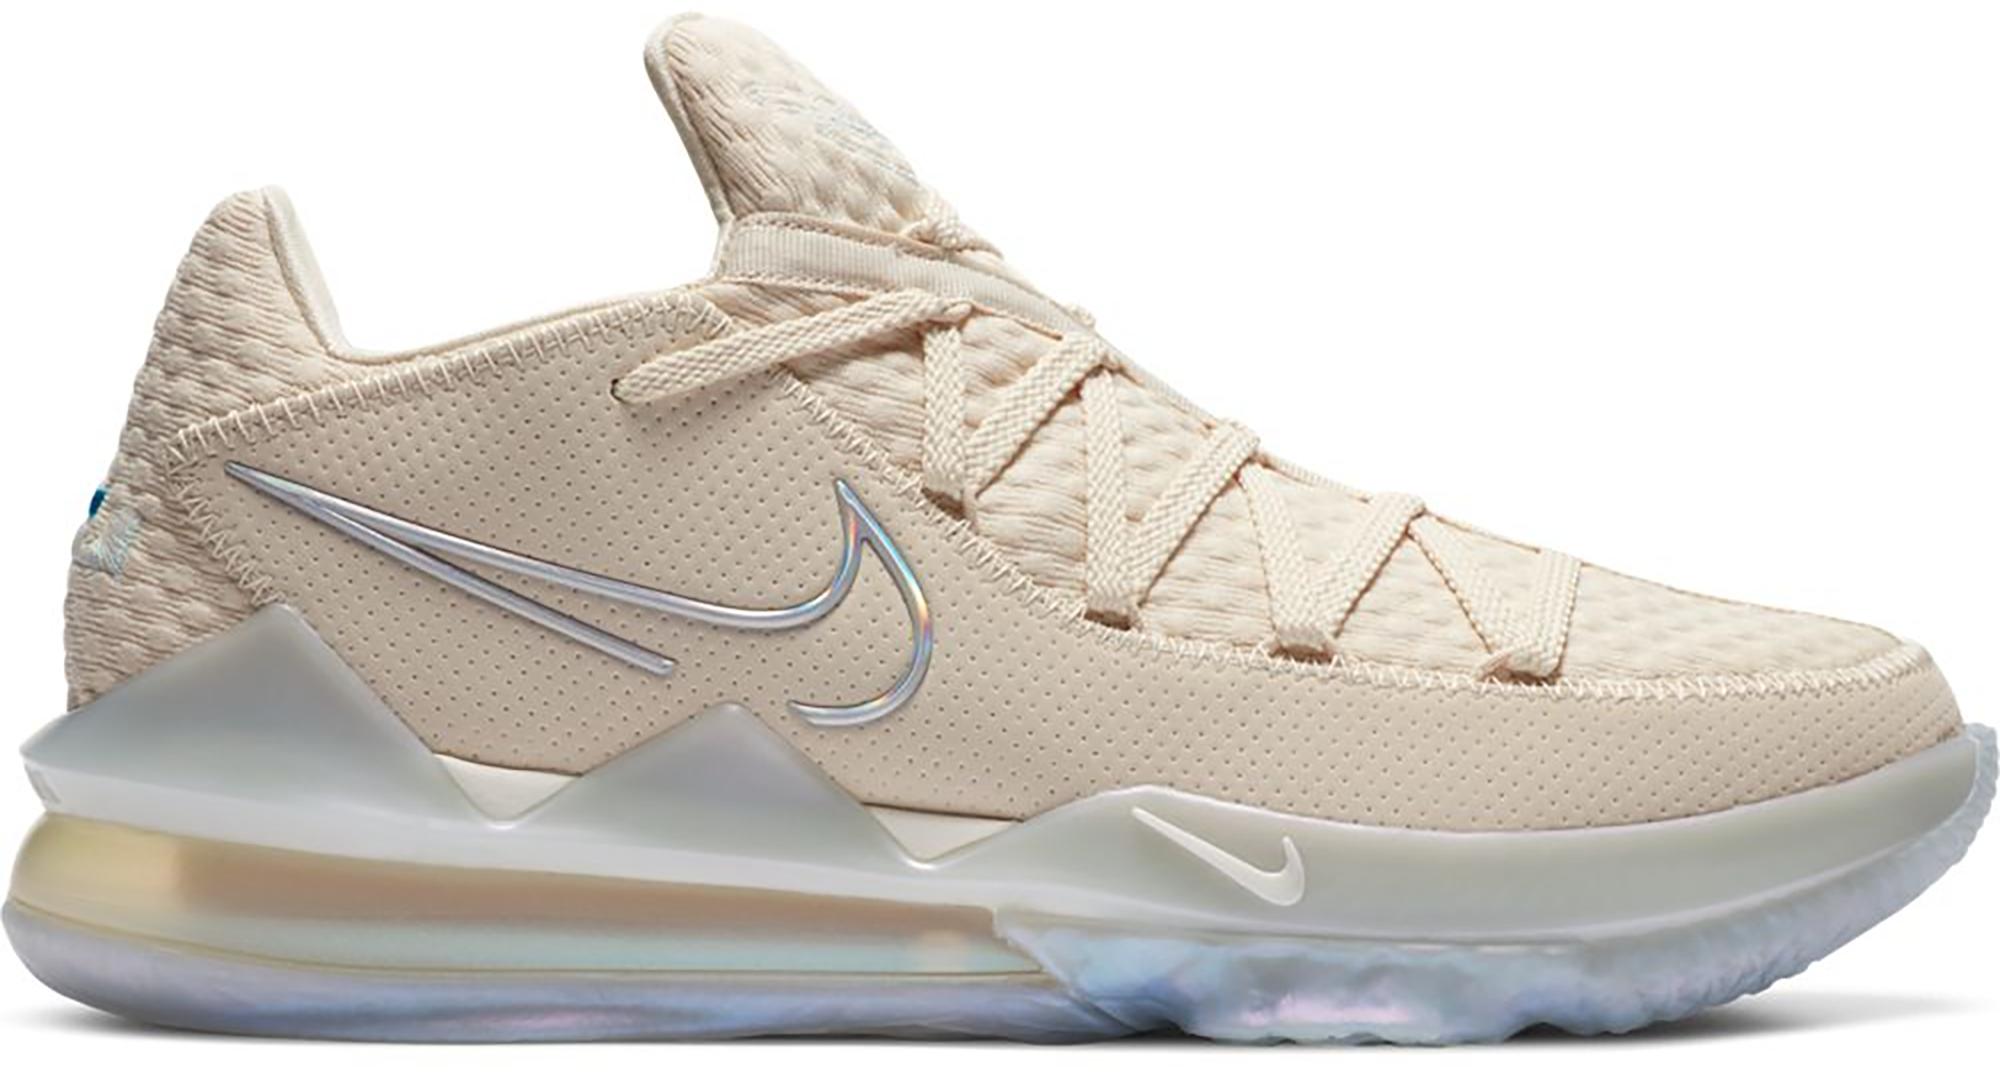 Nike LeBron 17 Low Easter (2020